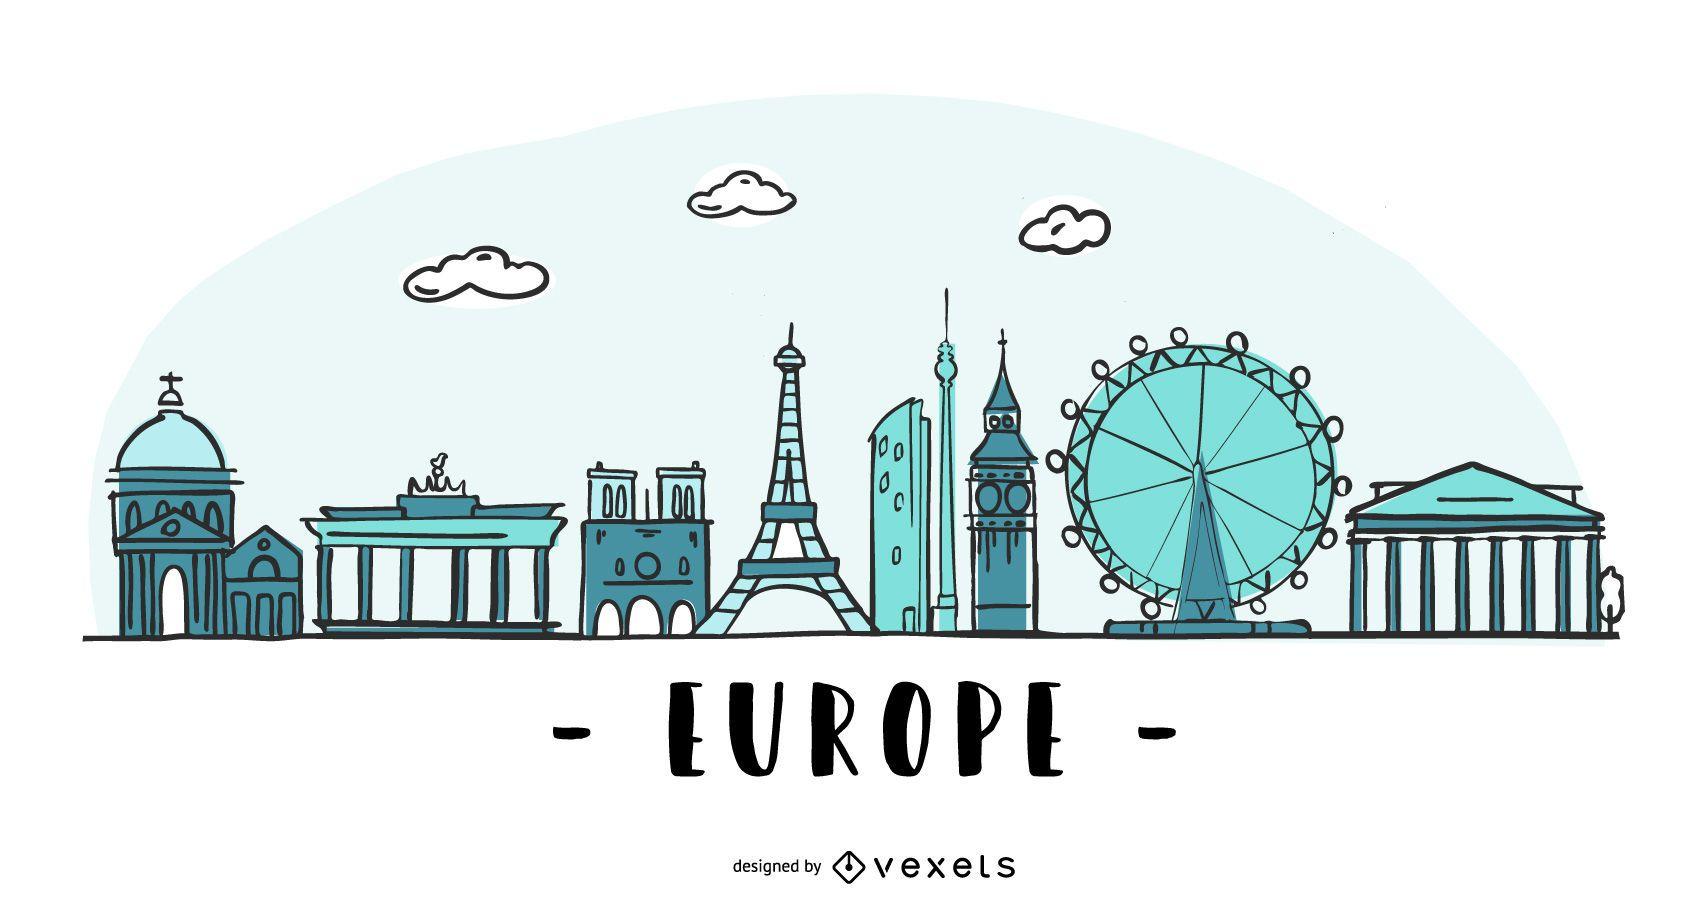 Europe Colored Skyline Illustration